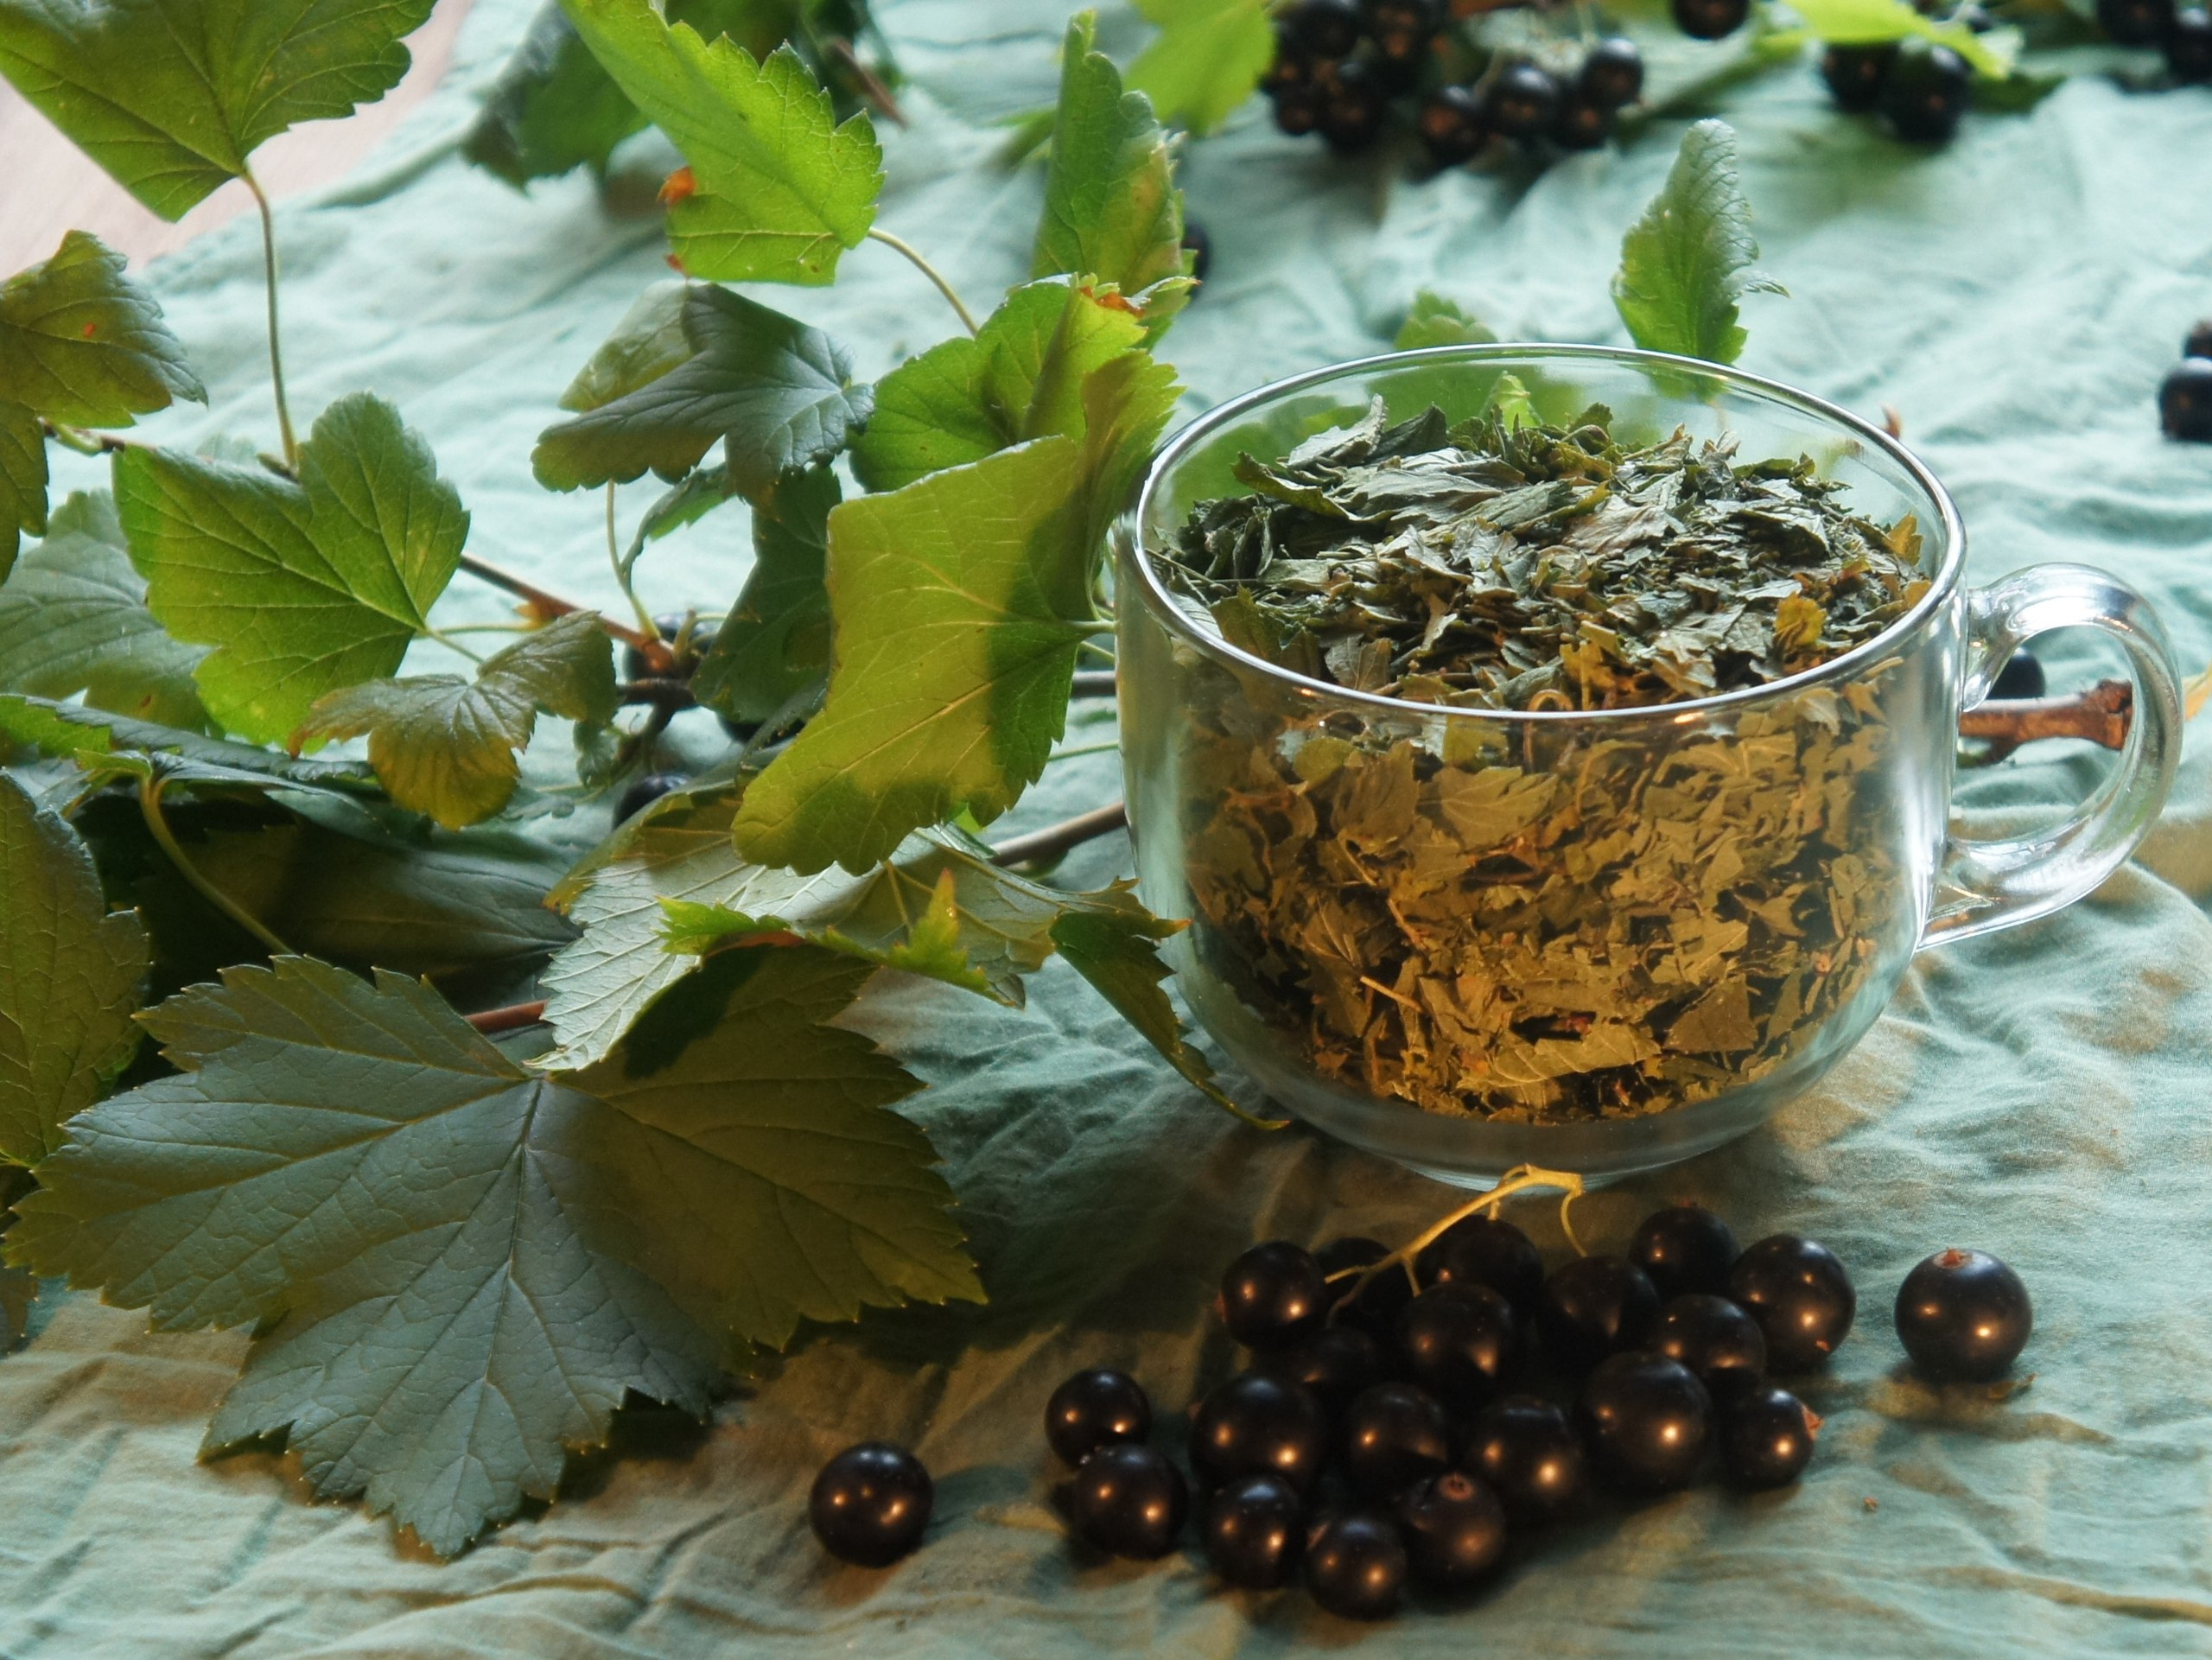 Сушка вишни в электросушилке, заготовка овощей